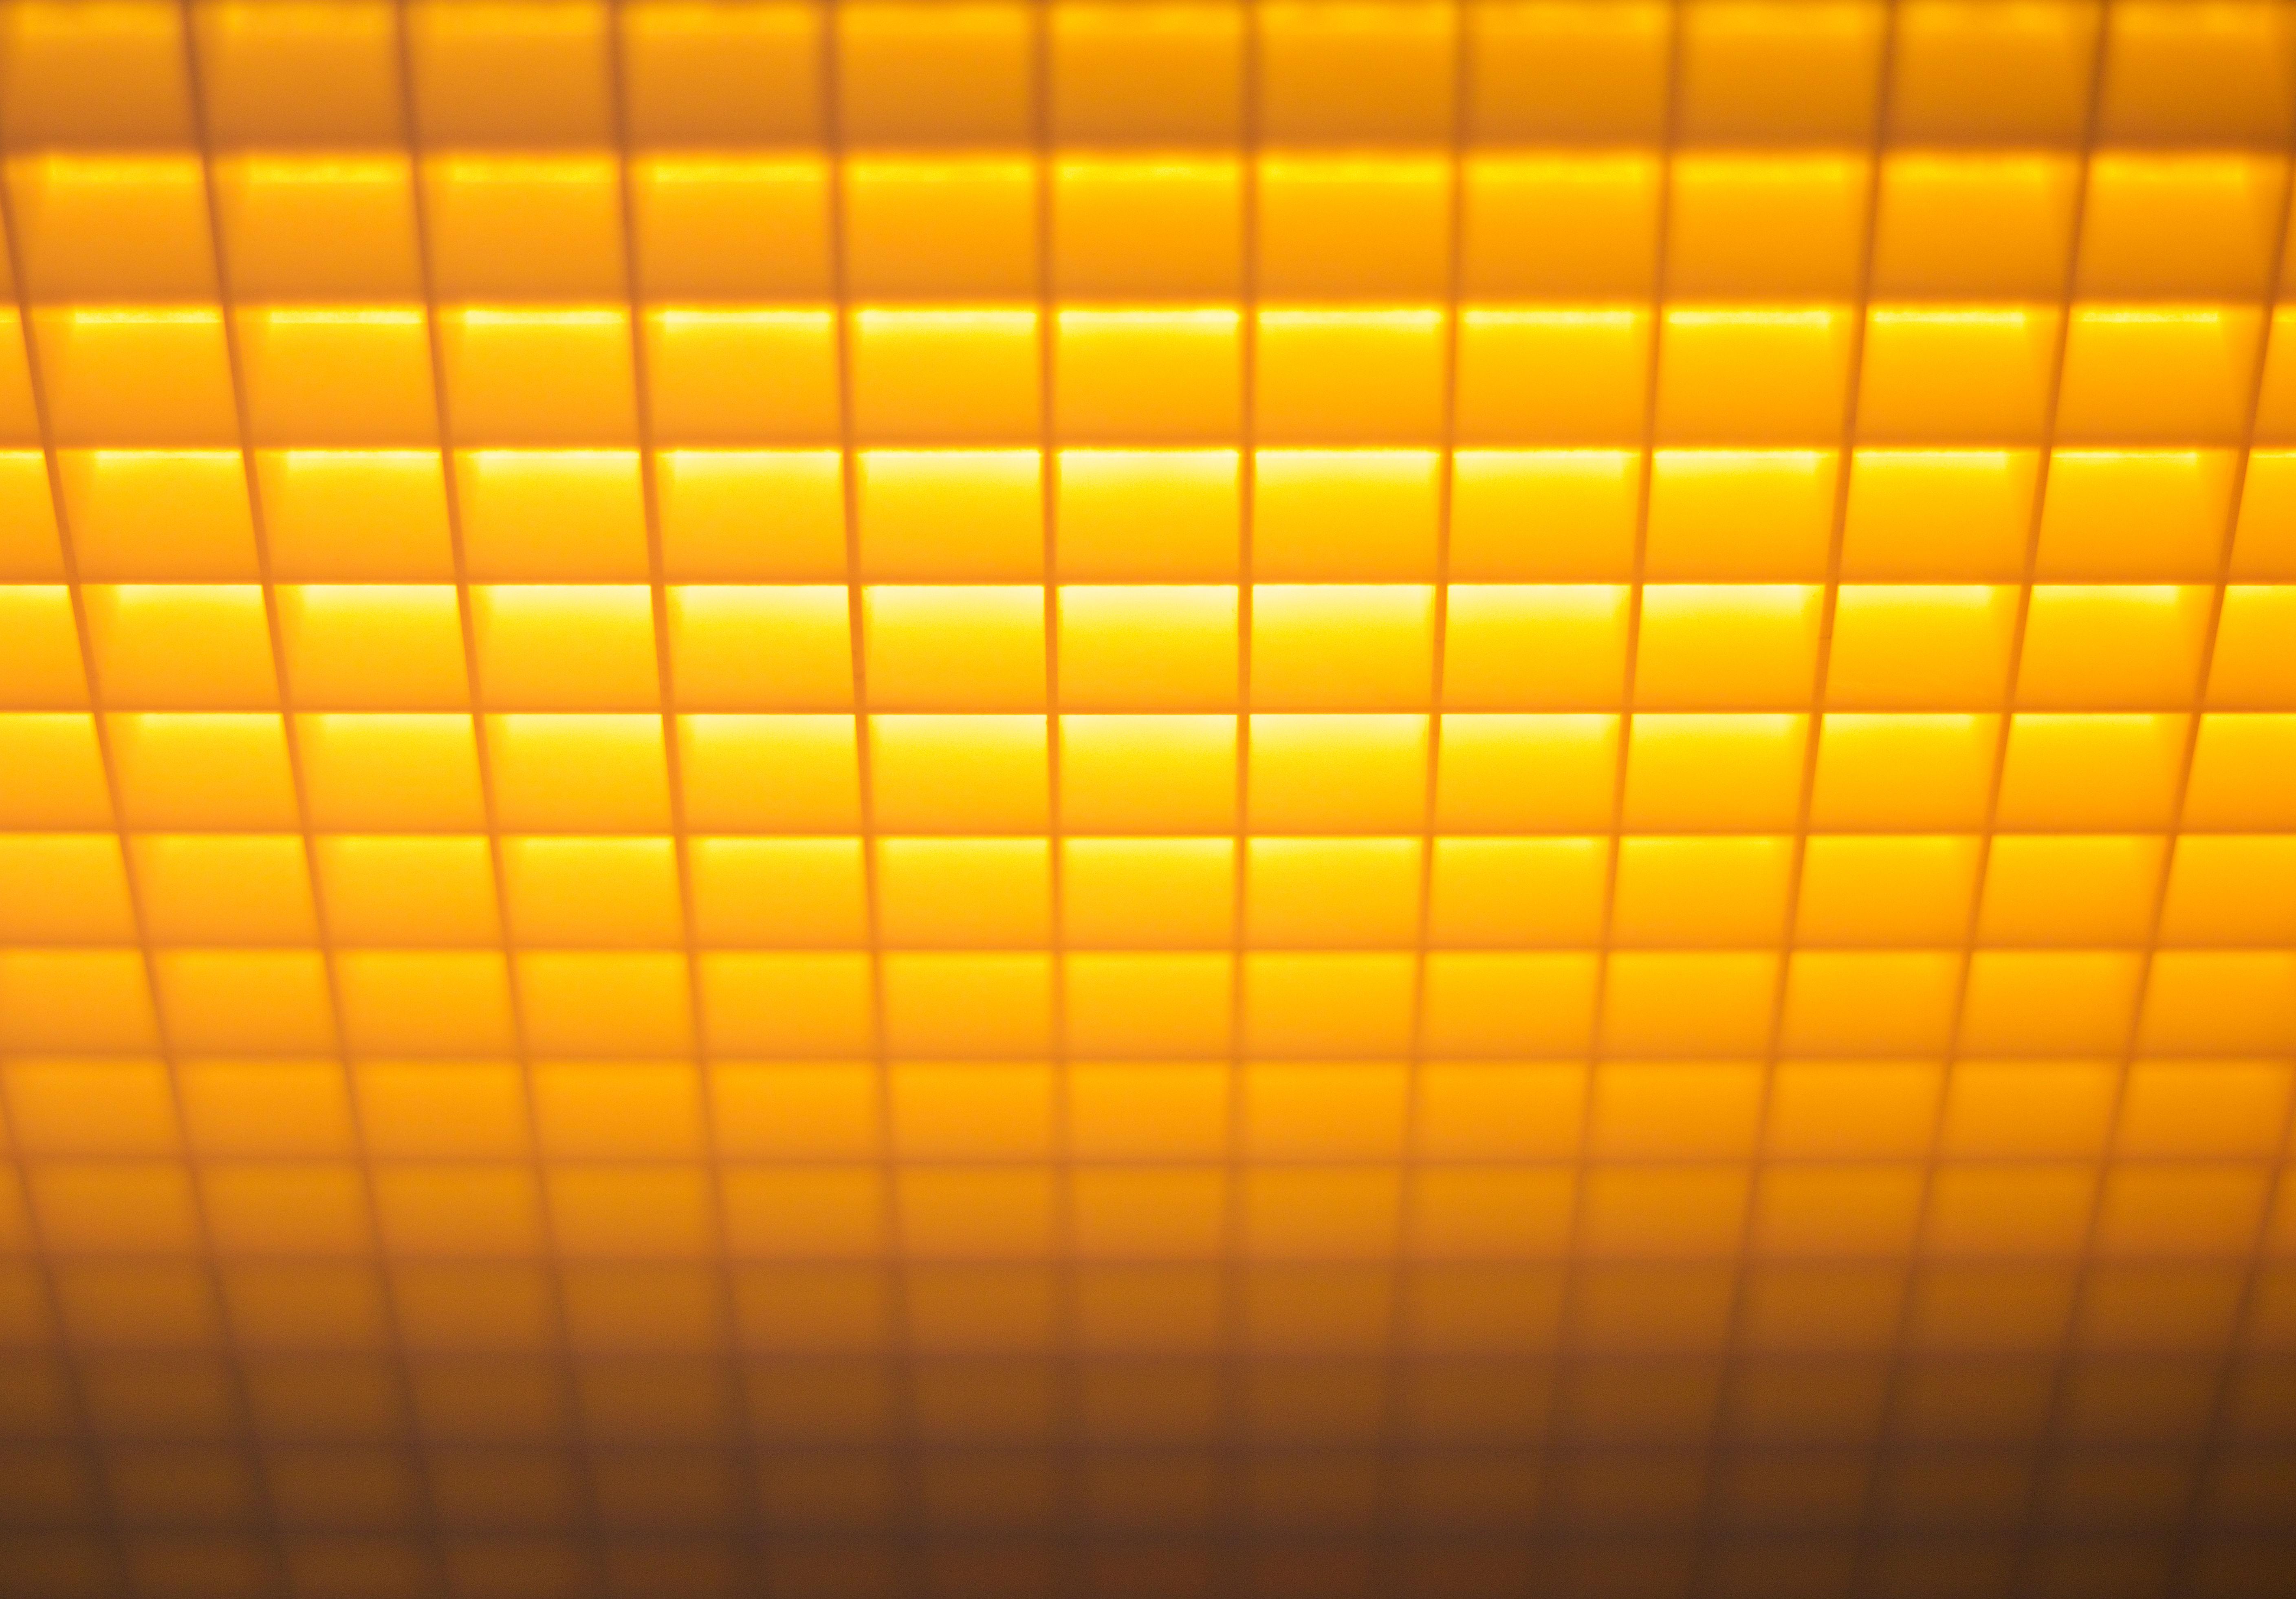 Free Images Light Sunlight Texture Orange Pattern